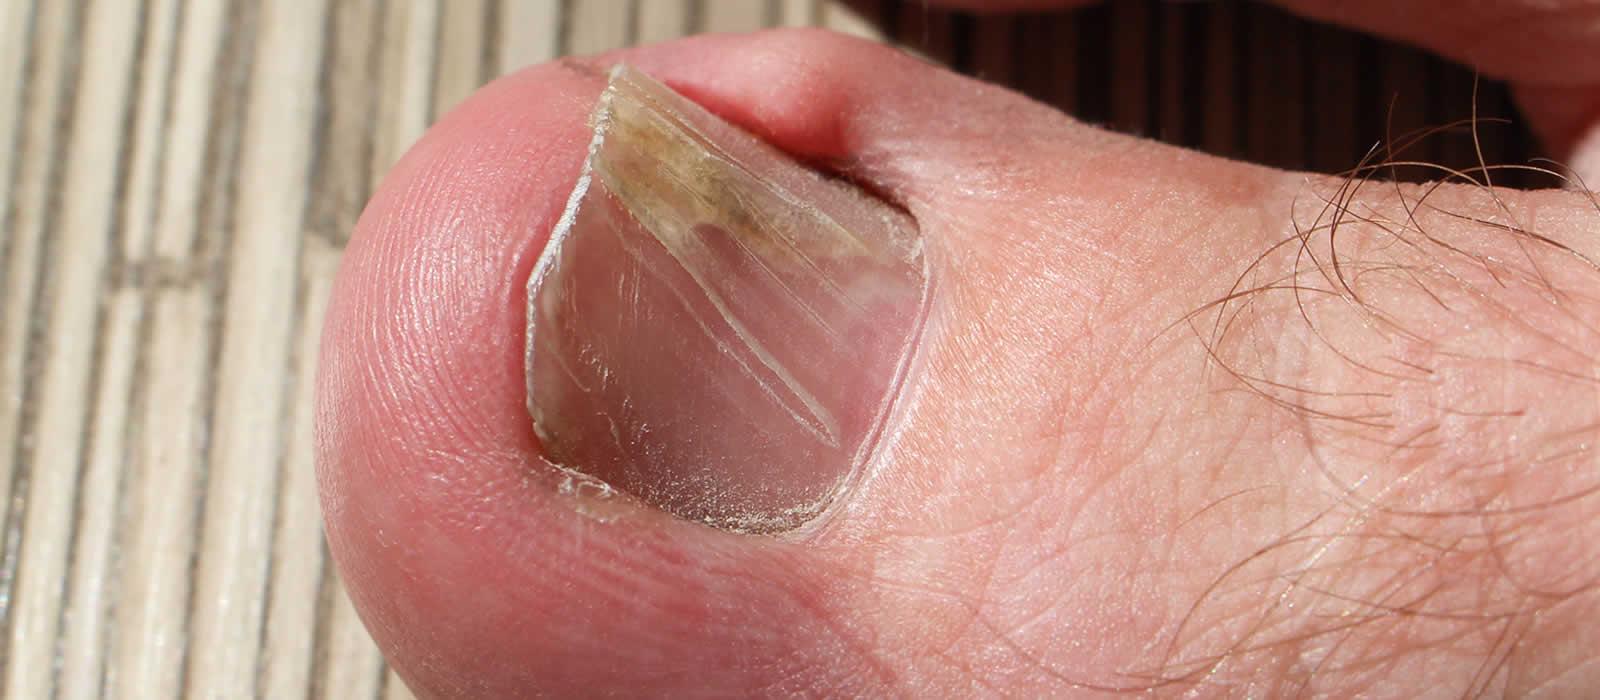 Ingrown Toenail: Symptoms, Causes, and Treatments | Dr. Geller